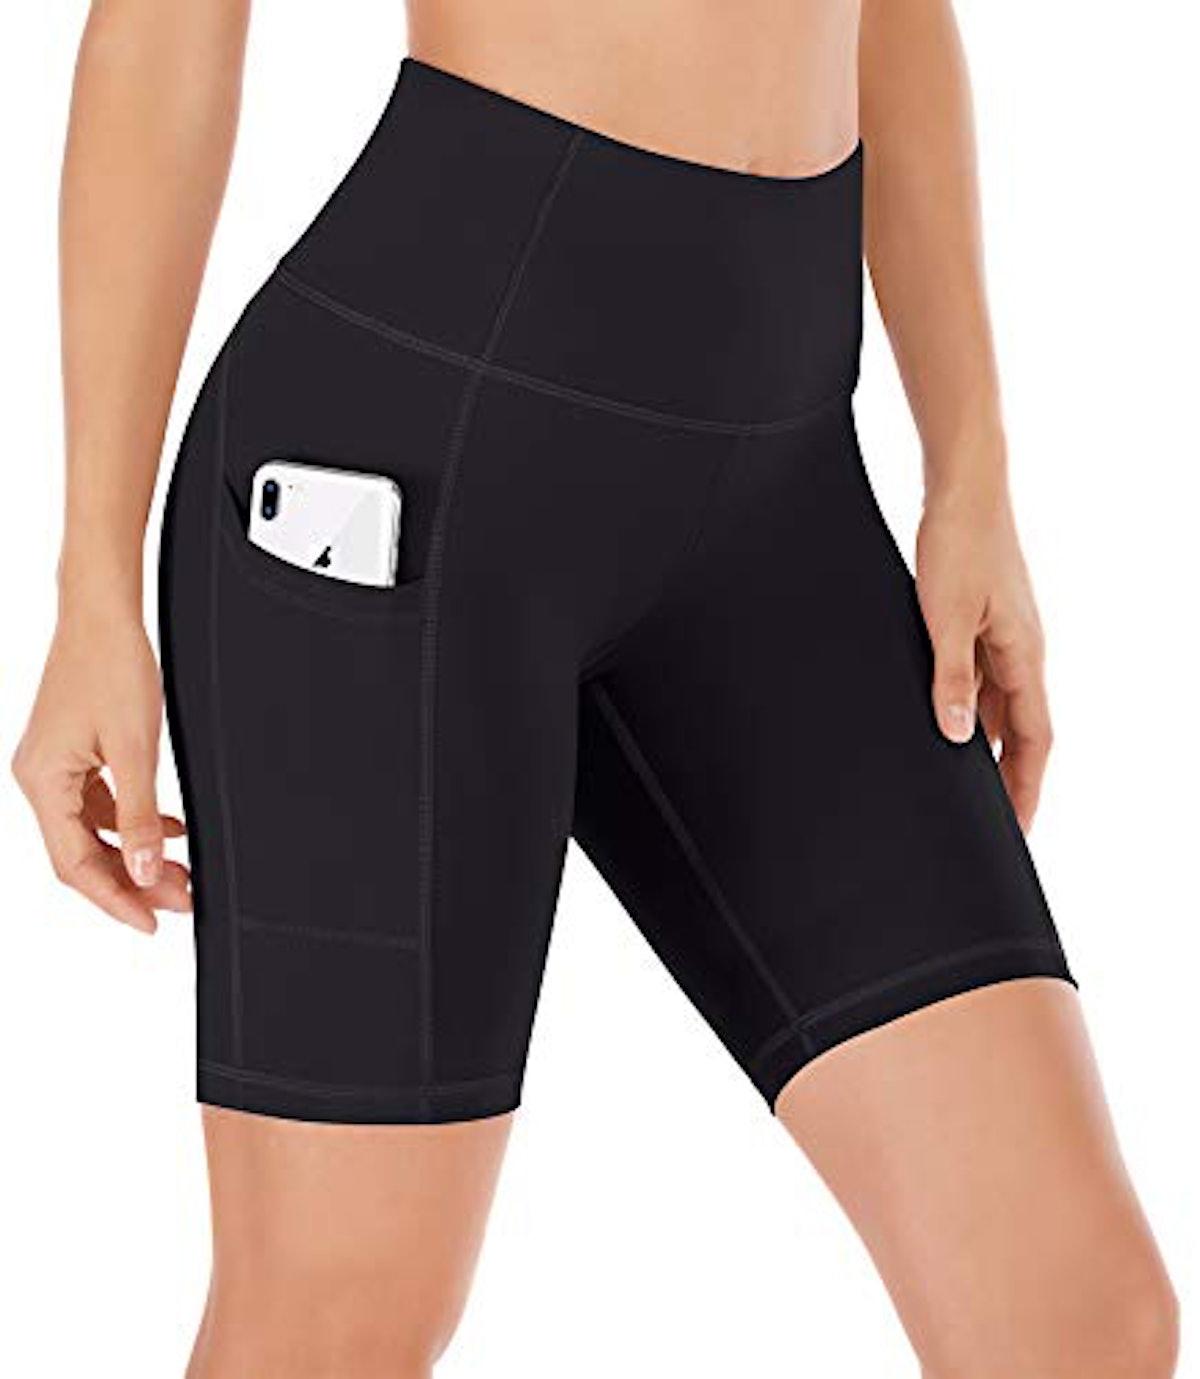 Ewedoos Compression Running Shorts with Pockets